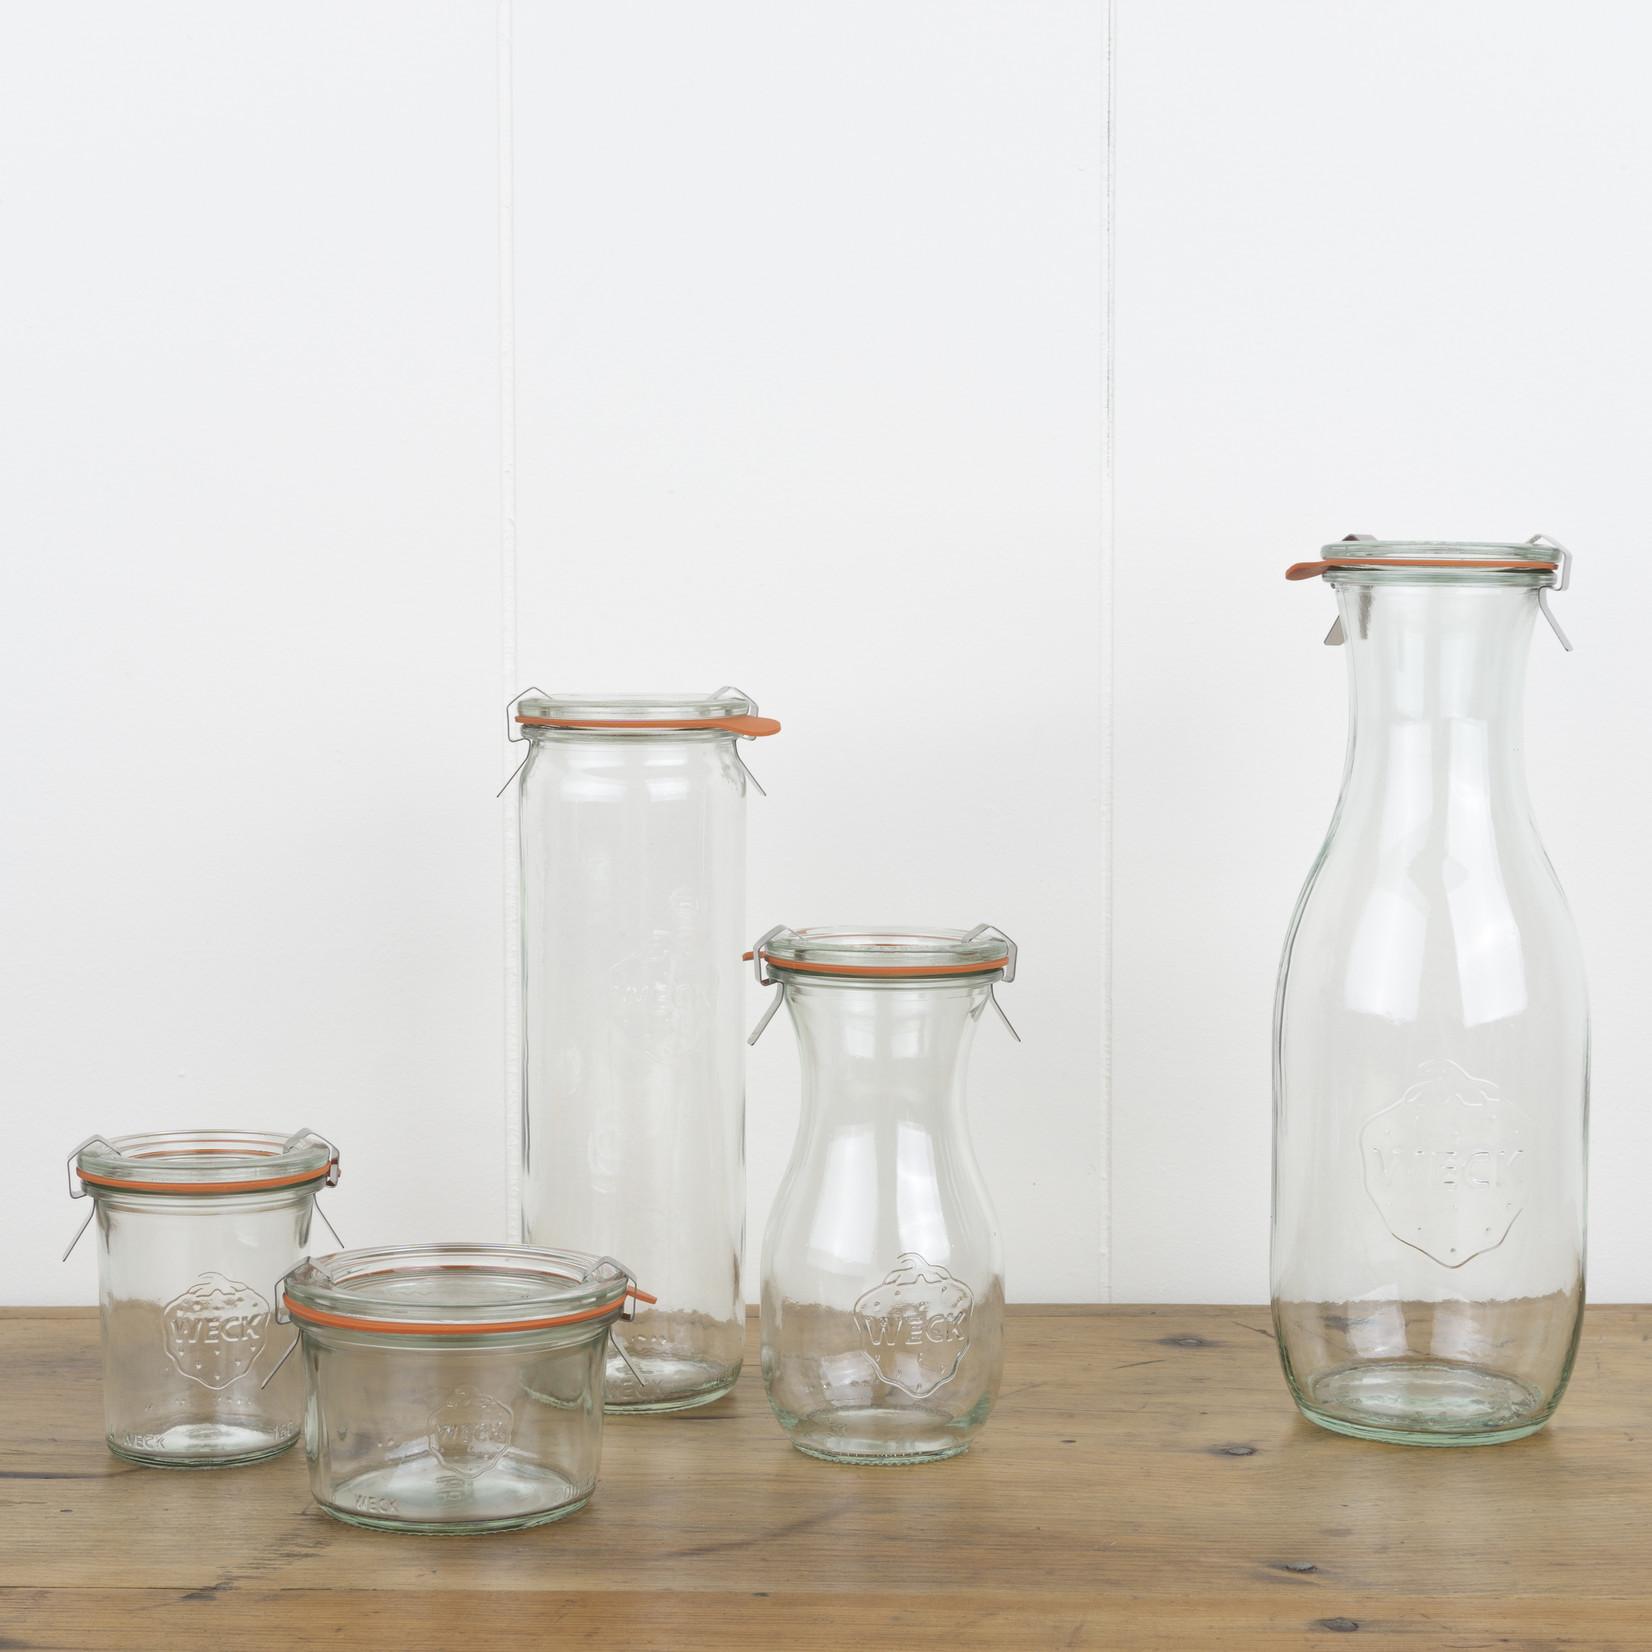 Weck Mold Jar